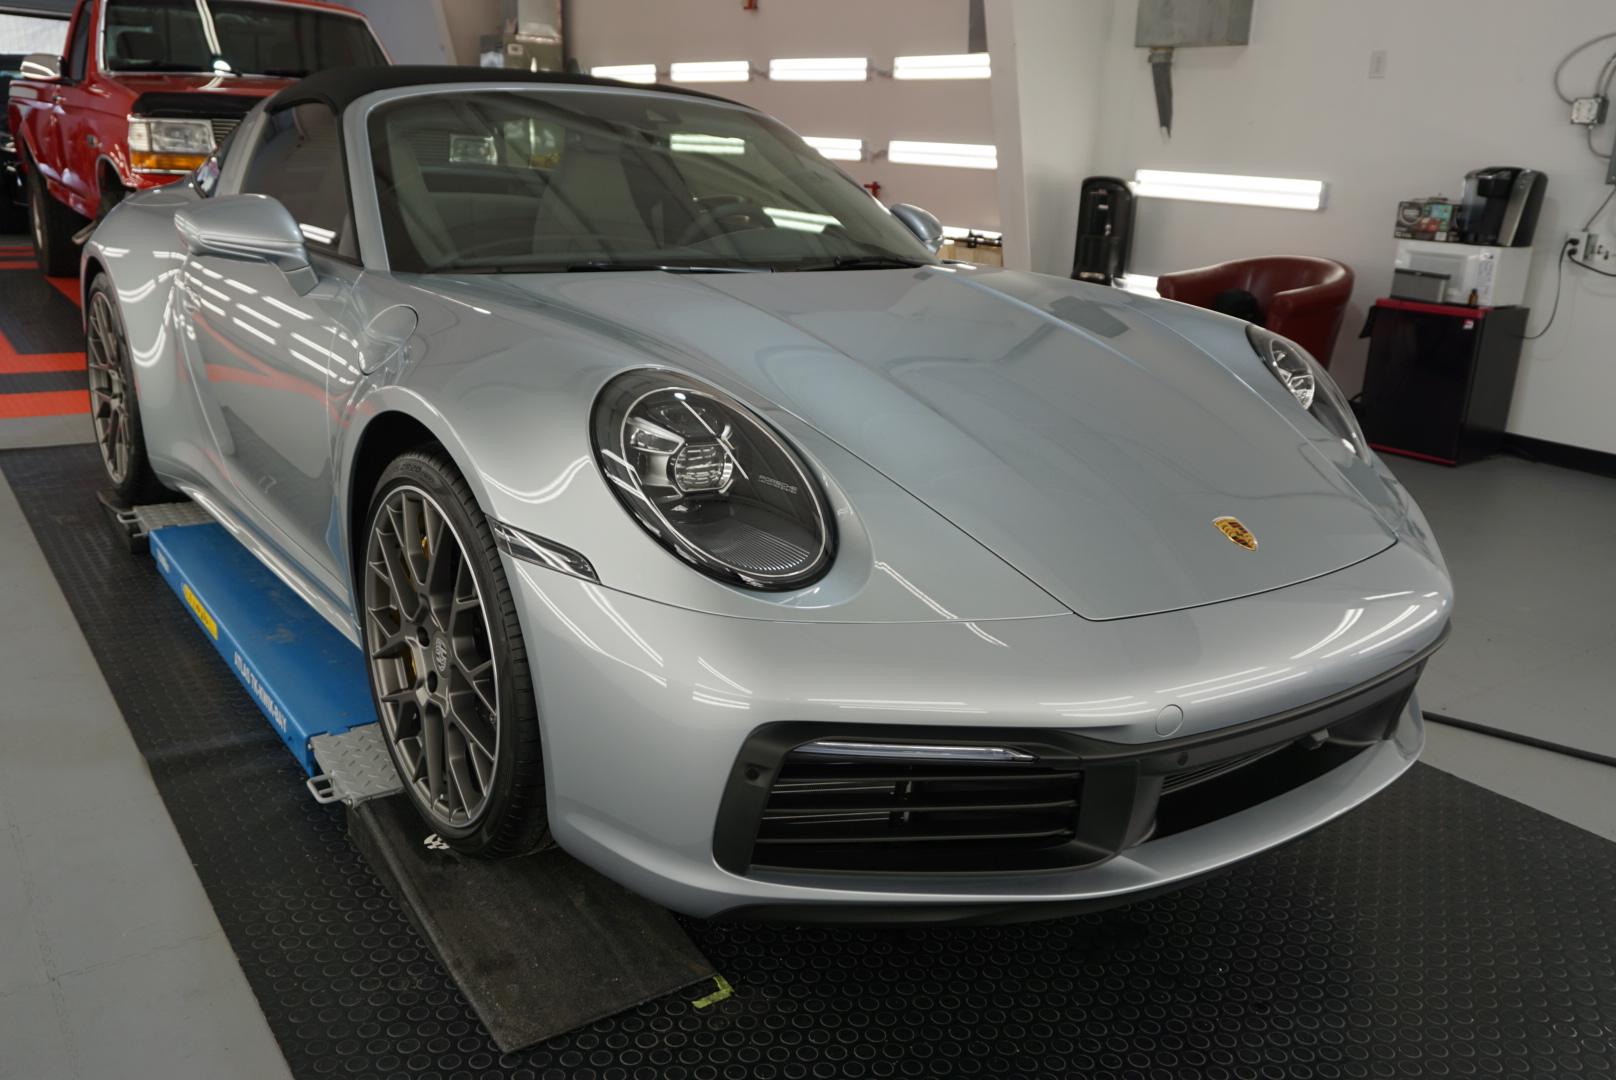 New Car Preparation of a 2020 Porsche 911